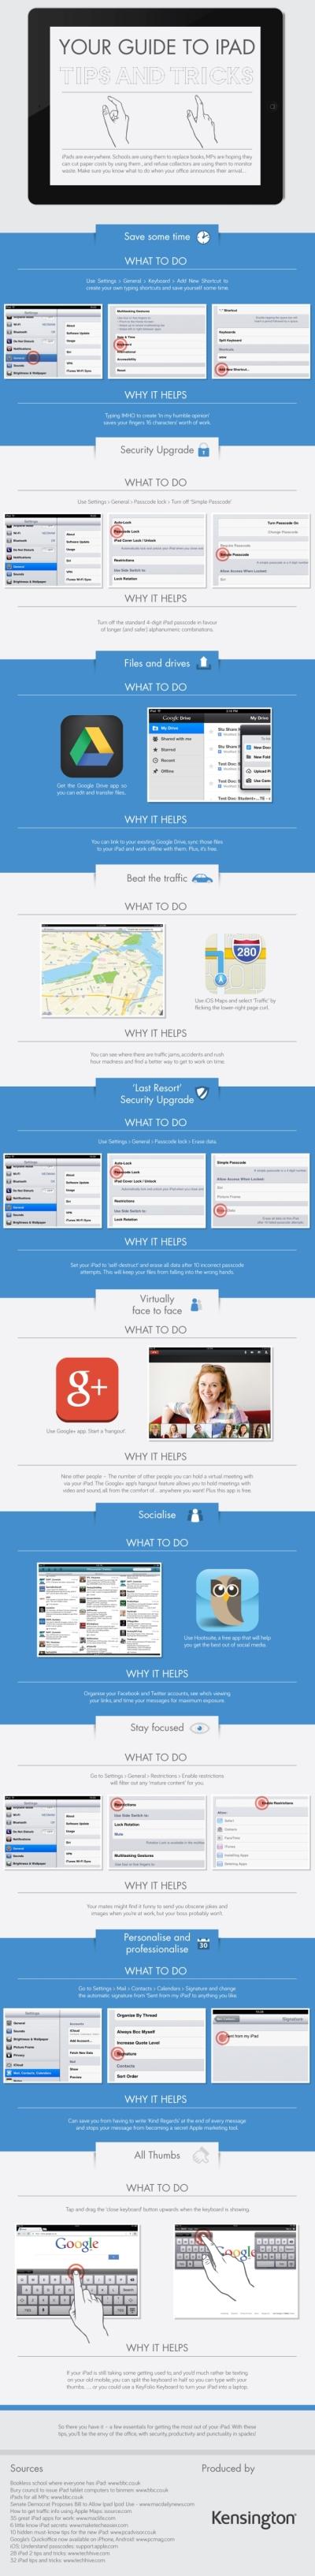 iPad-tips-infographic